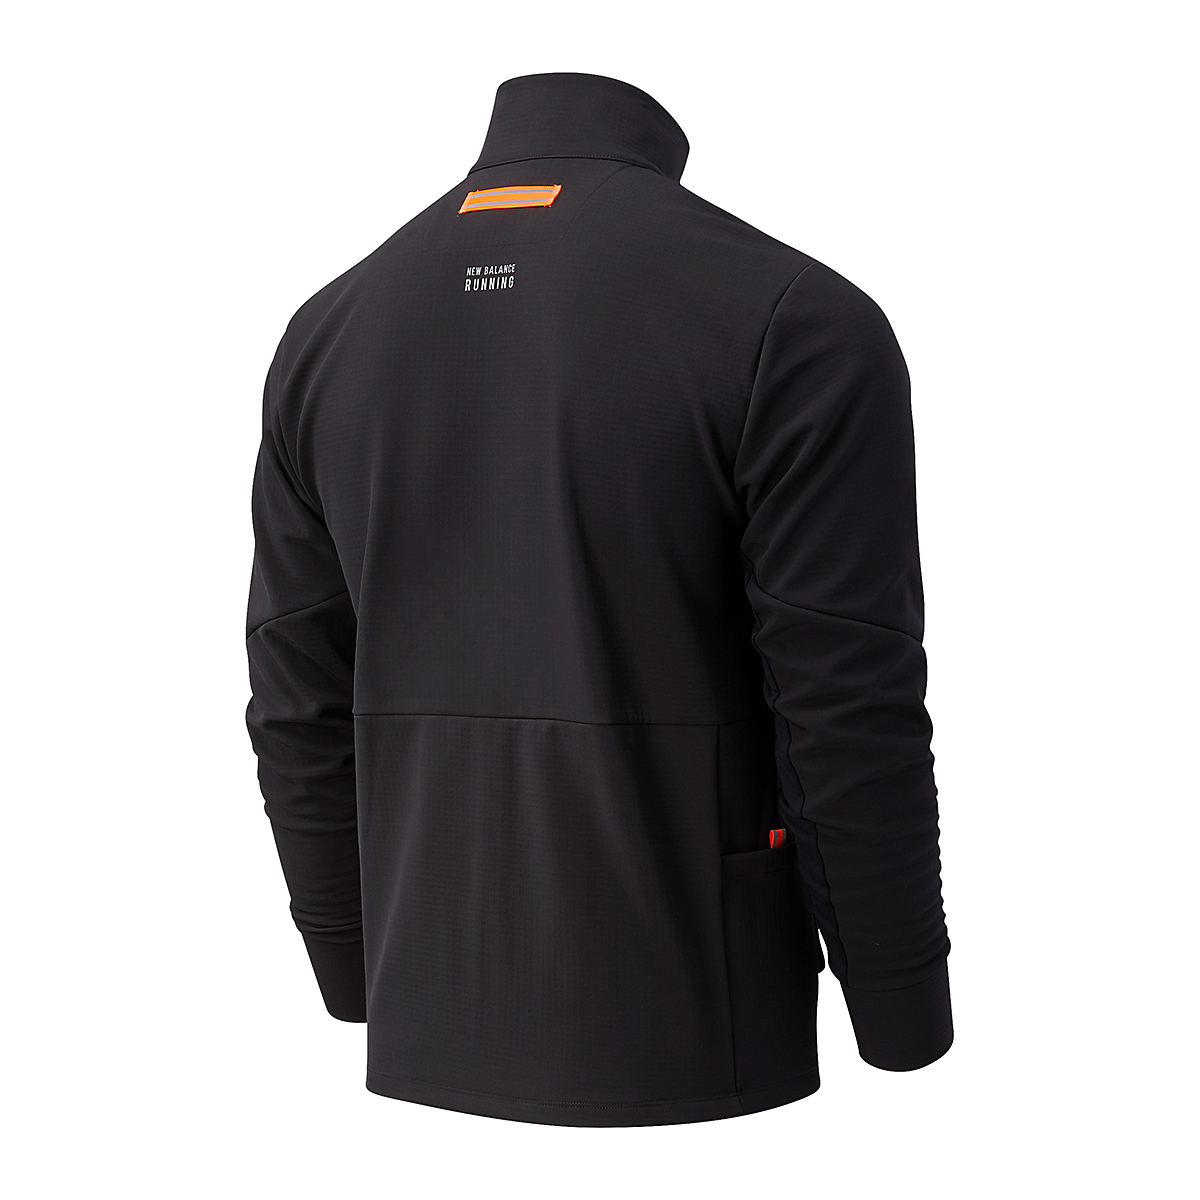 Men's New Balance Impact Run Winter Jacket - Color: Black - Size: S, Black, large, image 2